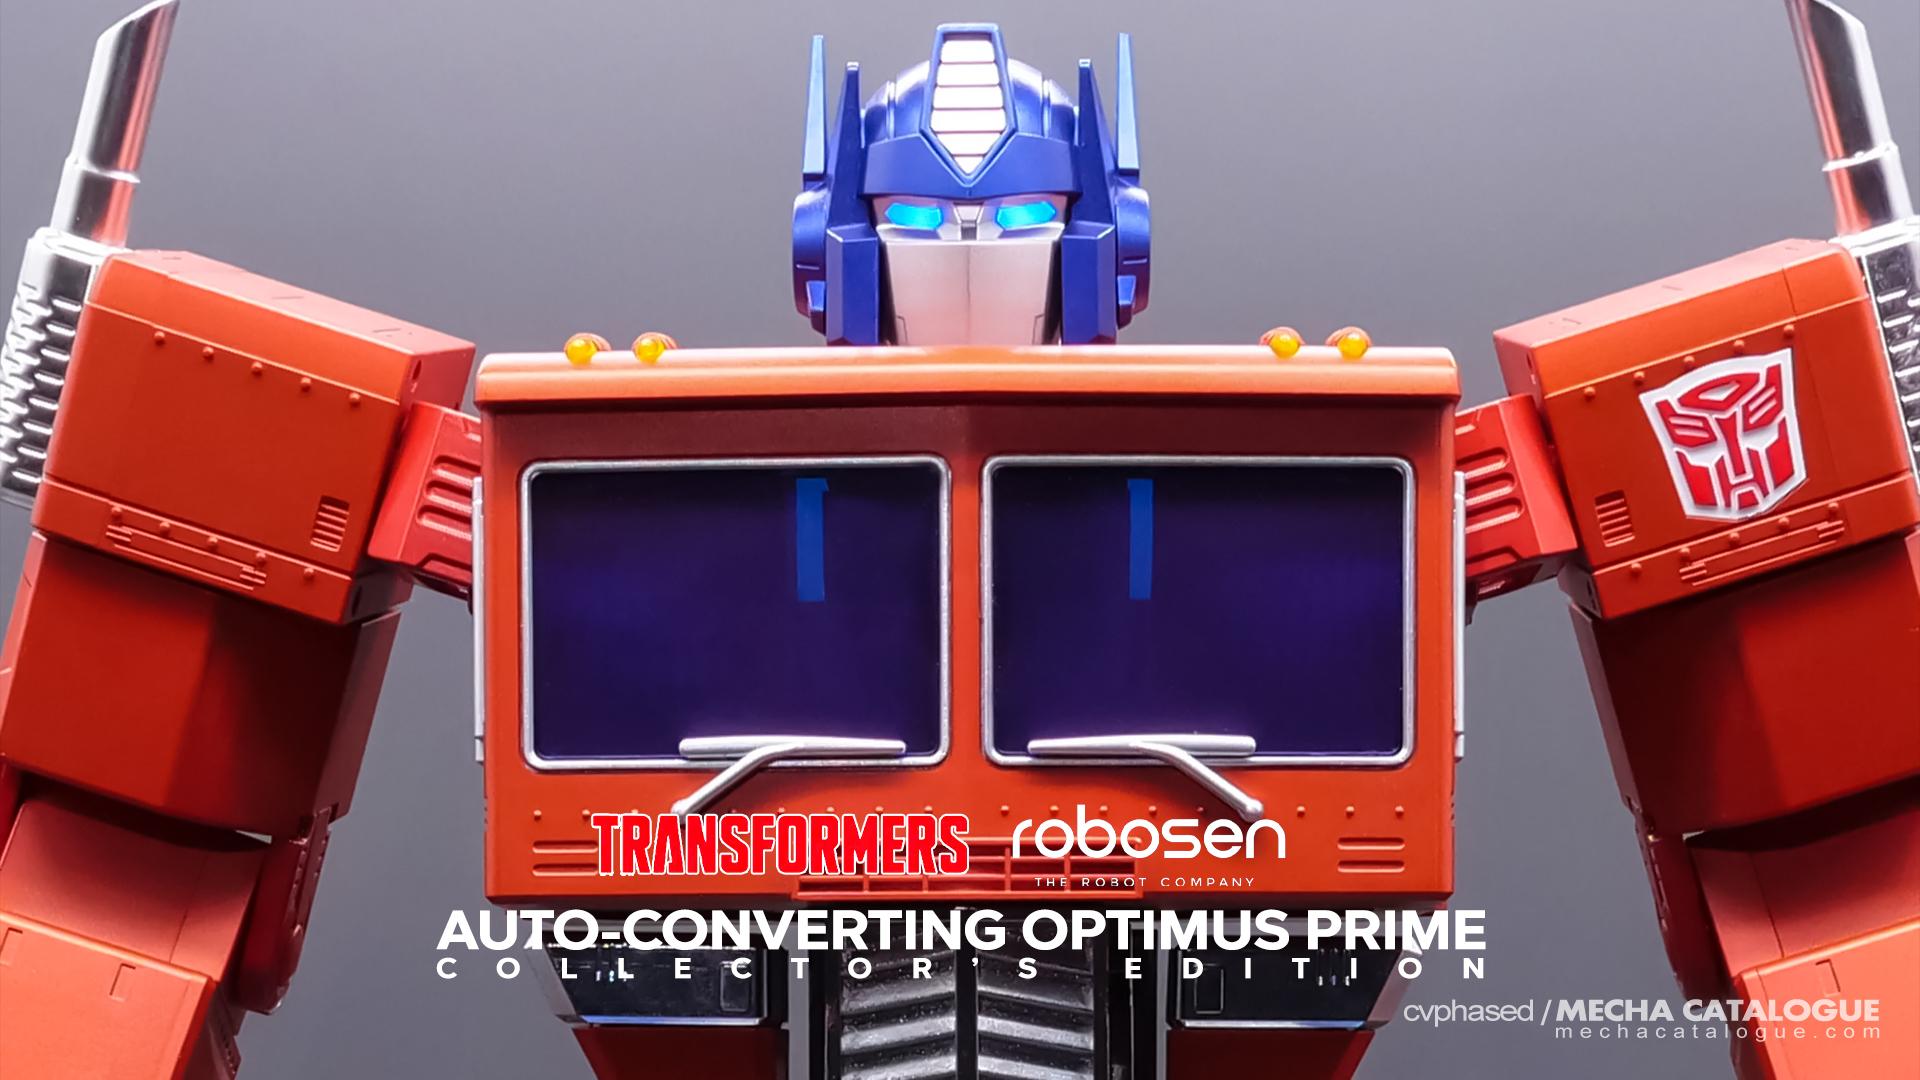 Featured image for Hasbro Pulse Fan Fest: Transformers Auto-Converting Optimus Prime